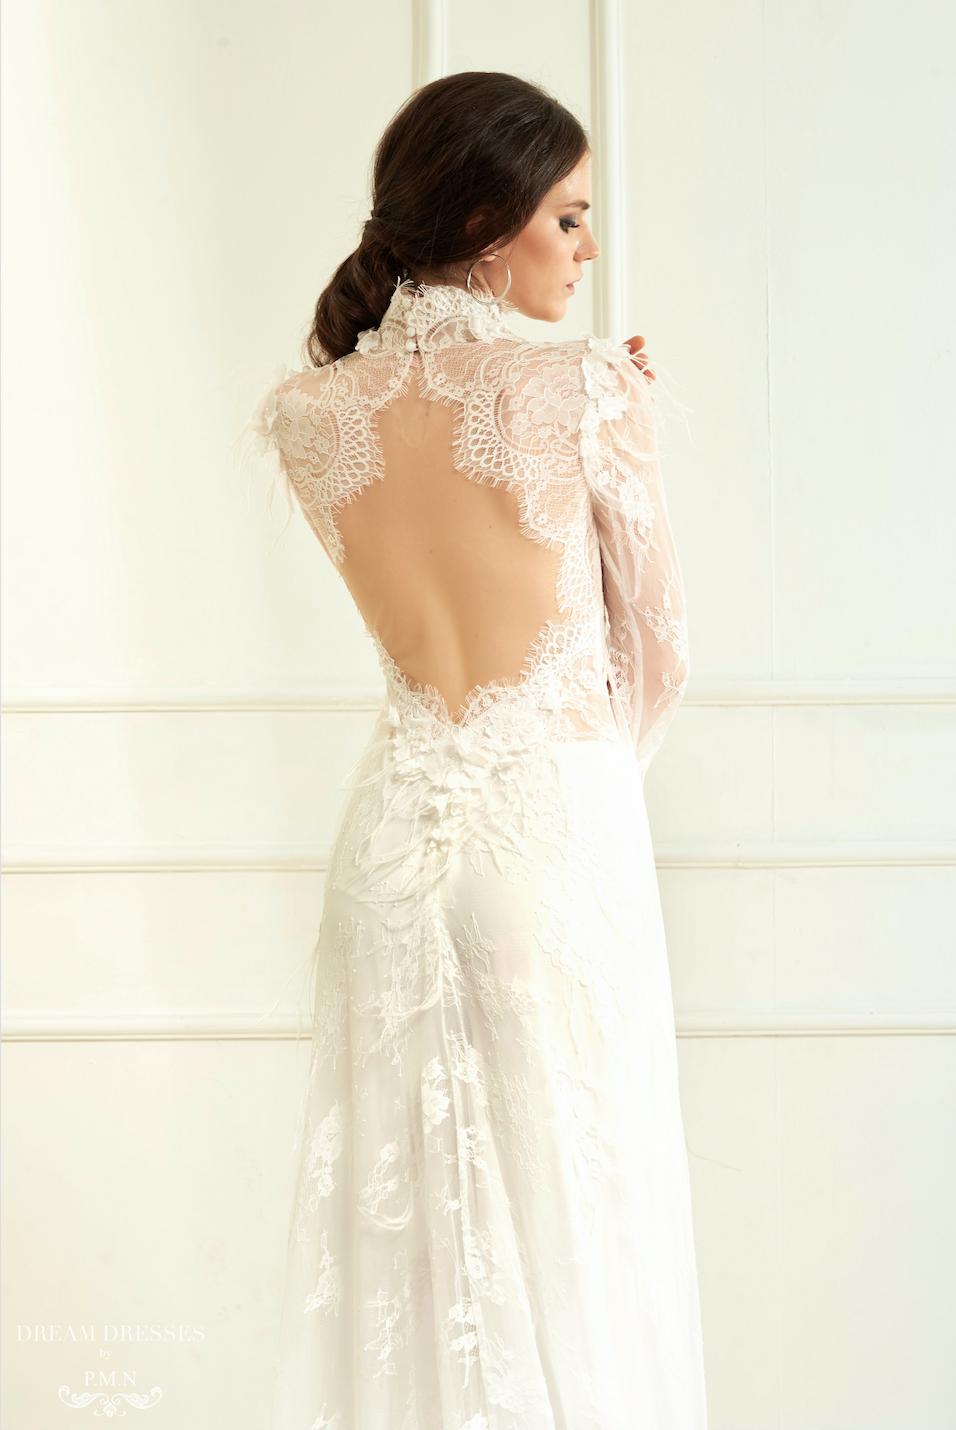 White Ao Dai Vietnamese Lace Bridal Dress (ALANNAH